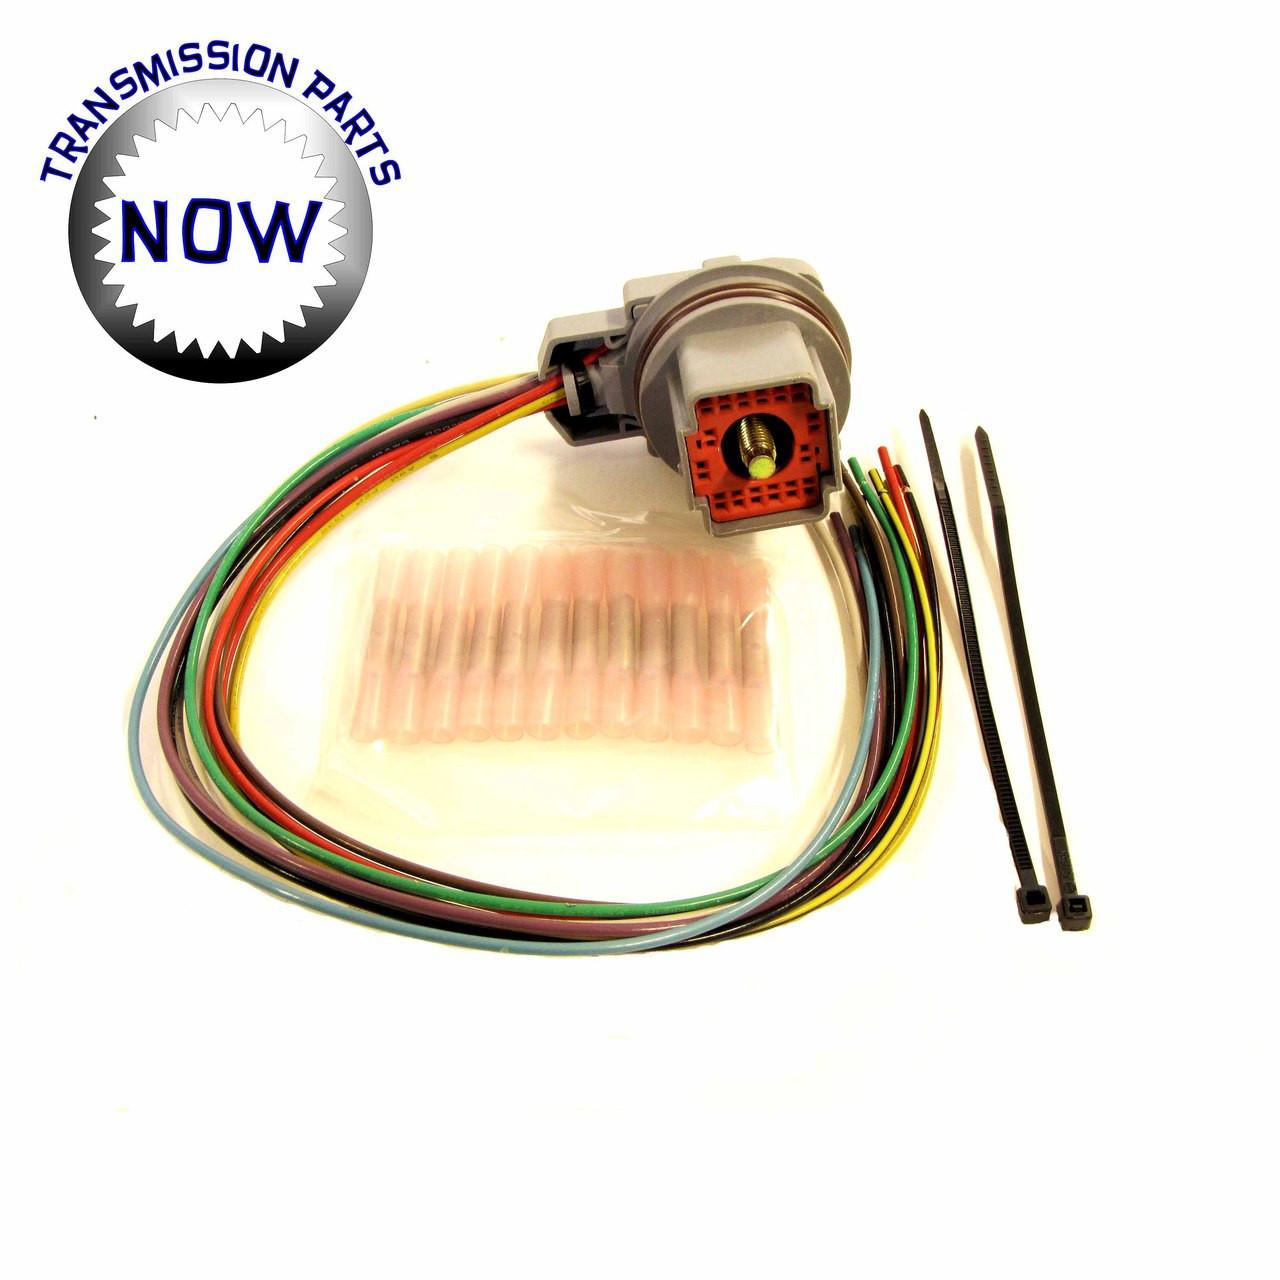 5R55W 5R55S solenoid connector repair wiring 46445AK